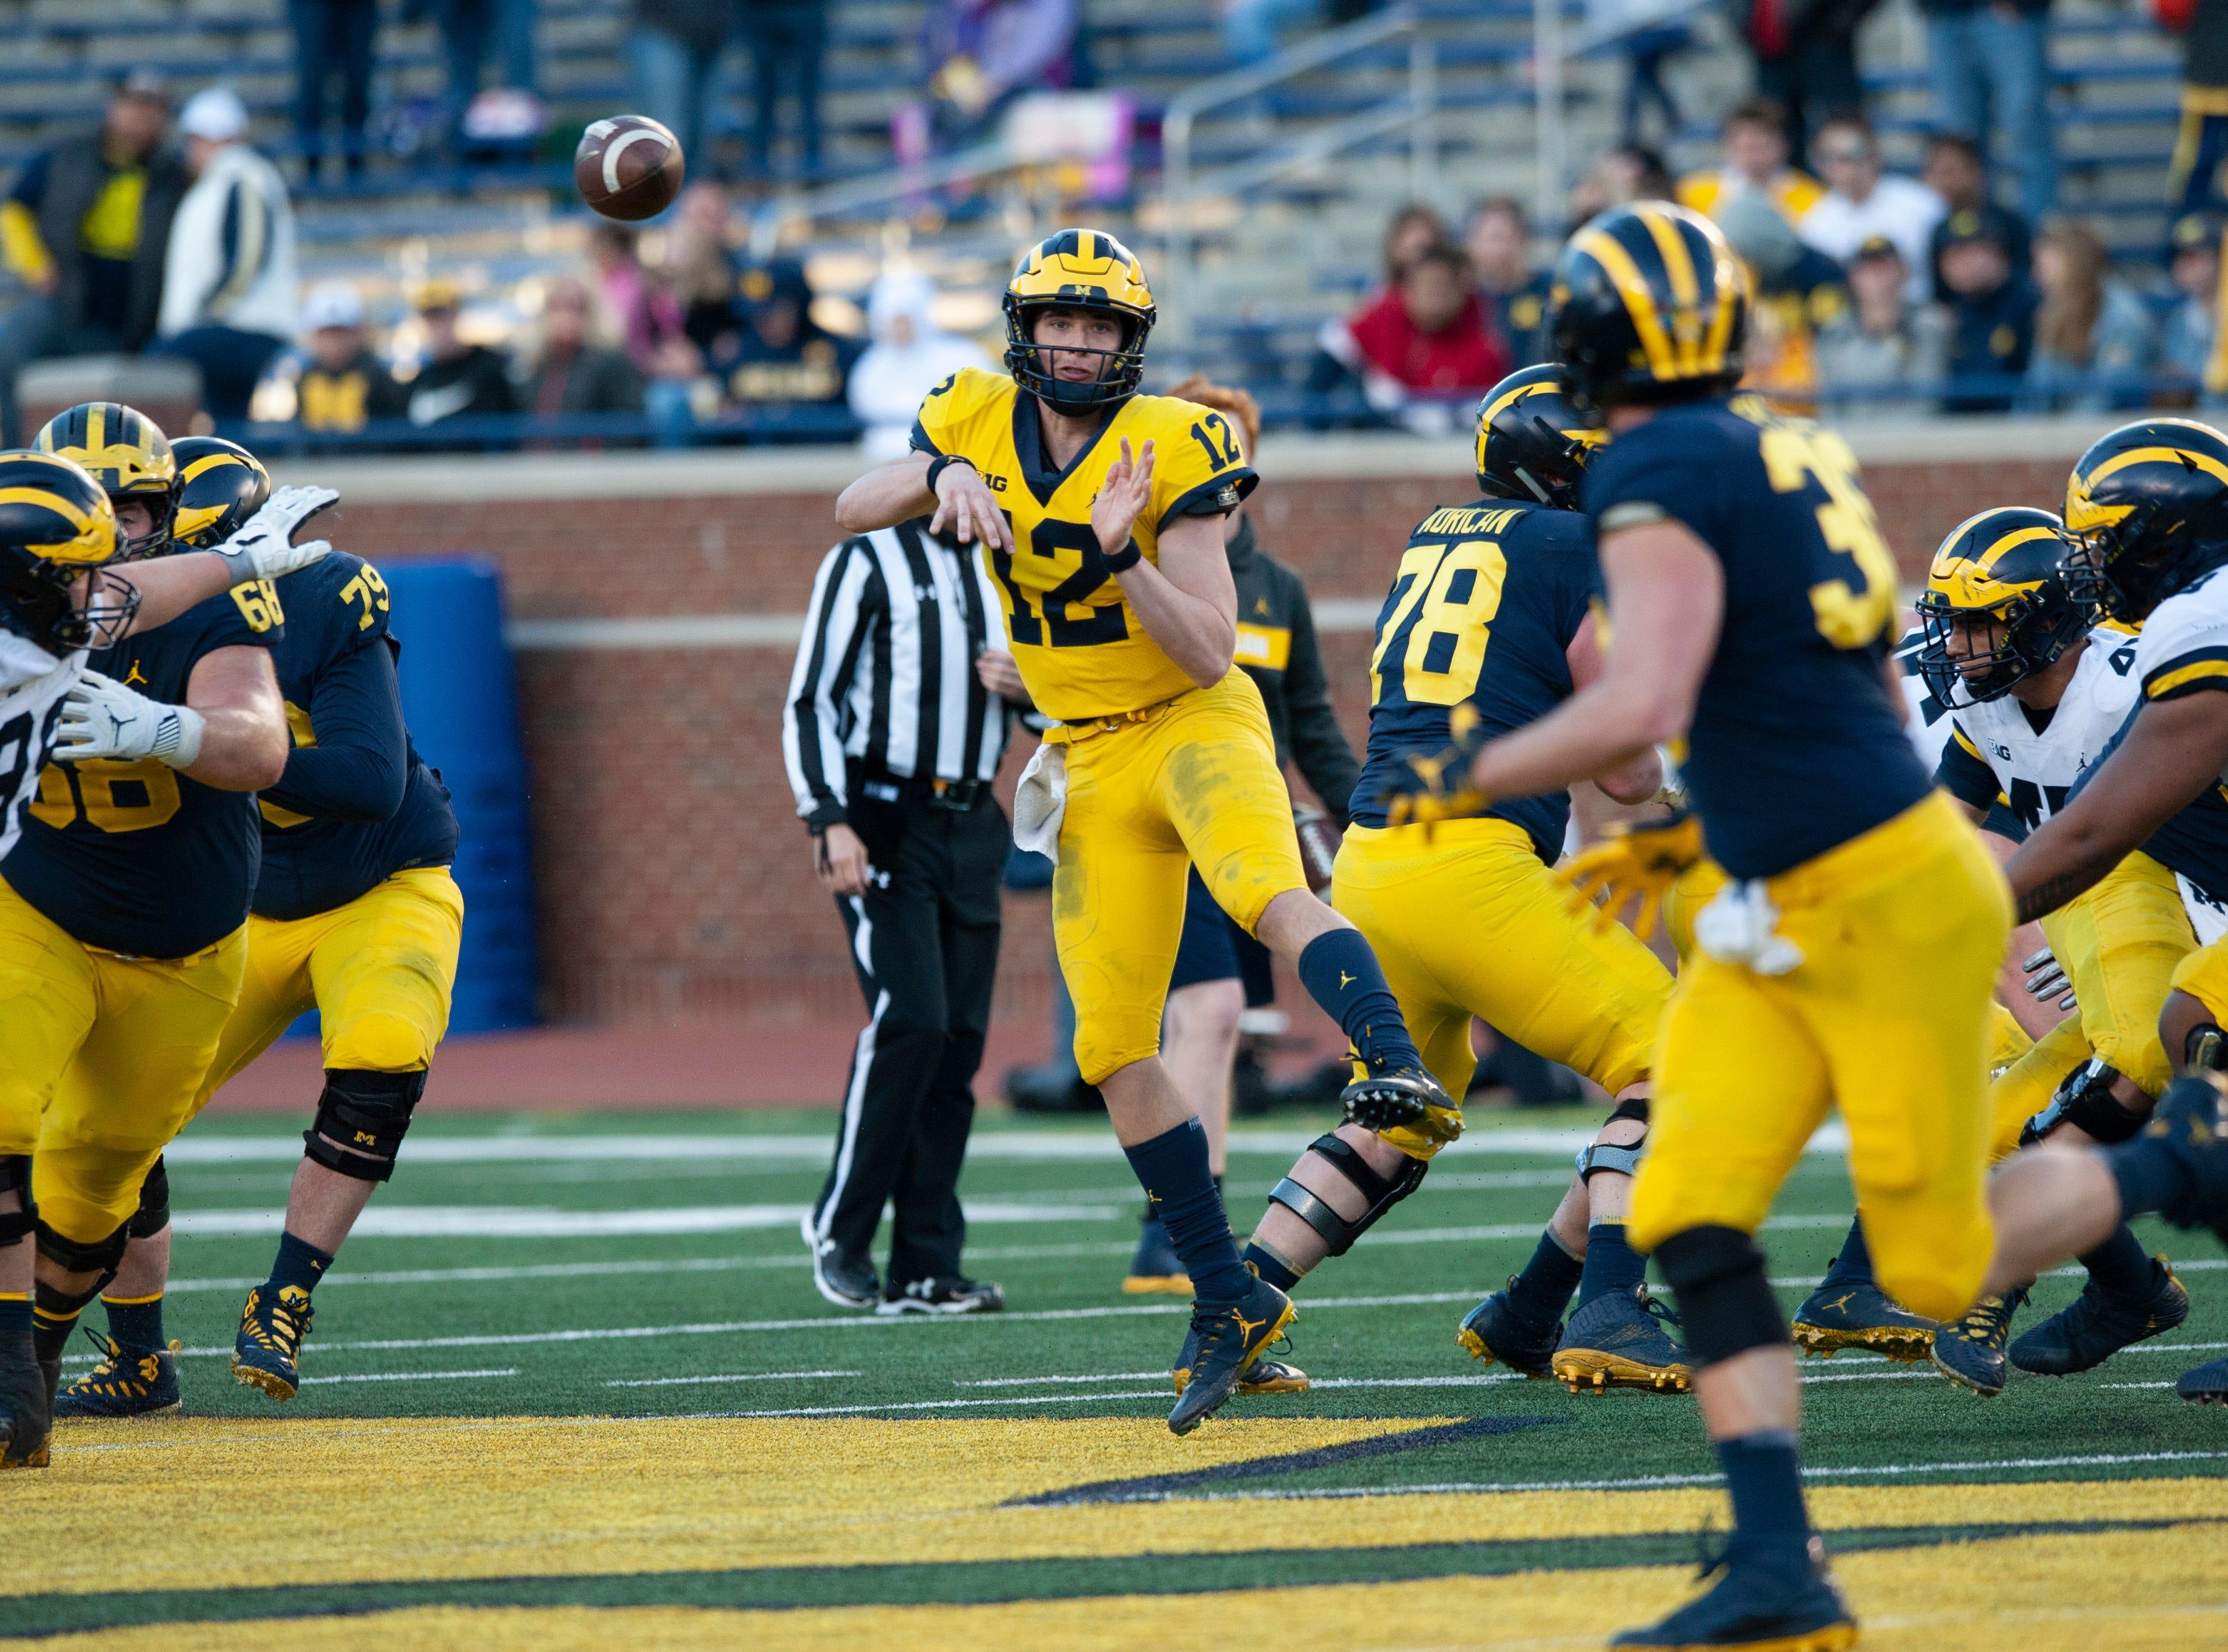 Michigan freshman QB Cade McNamara throws a pass.  *** University of Michigan football spring game at Michigan Stadium in Ann Arbor on Saturday, April 13, 2019. (John T. Greilick, The Detroit News)